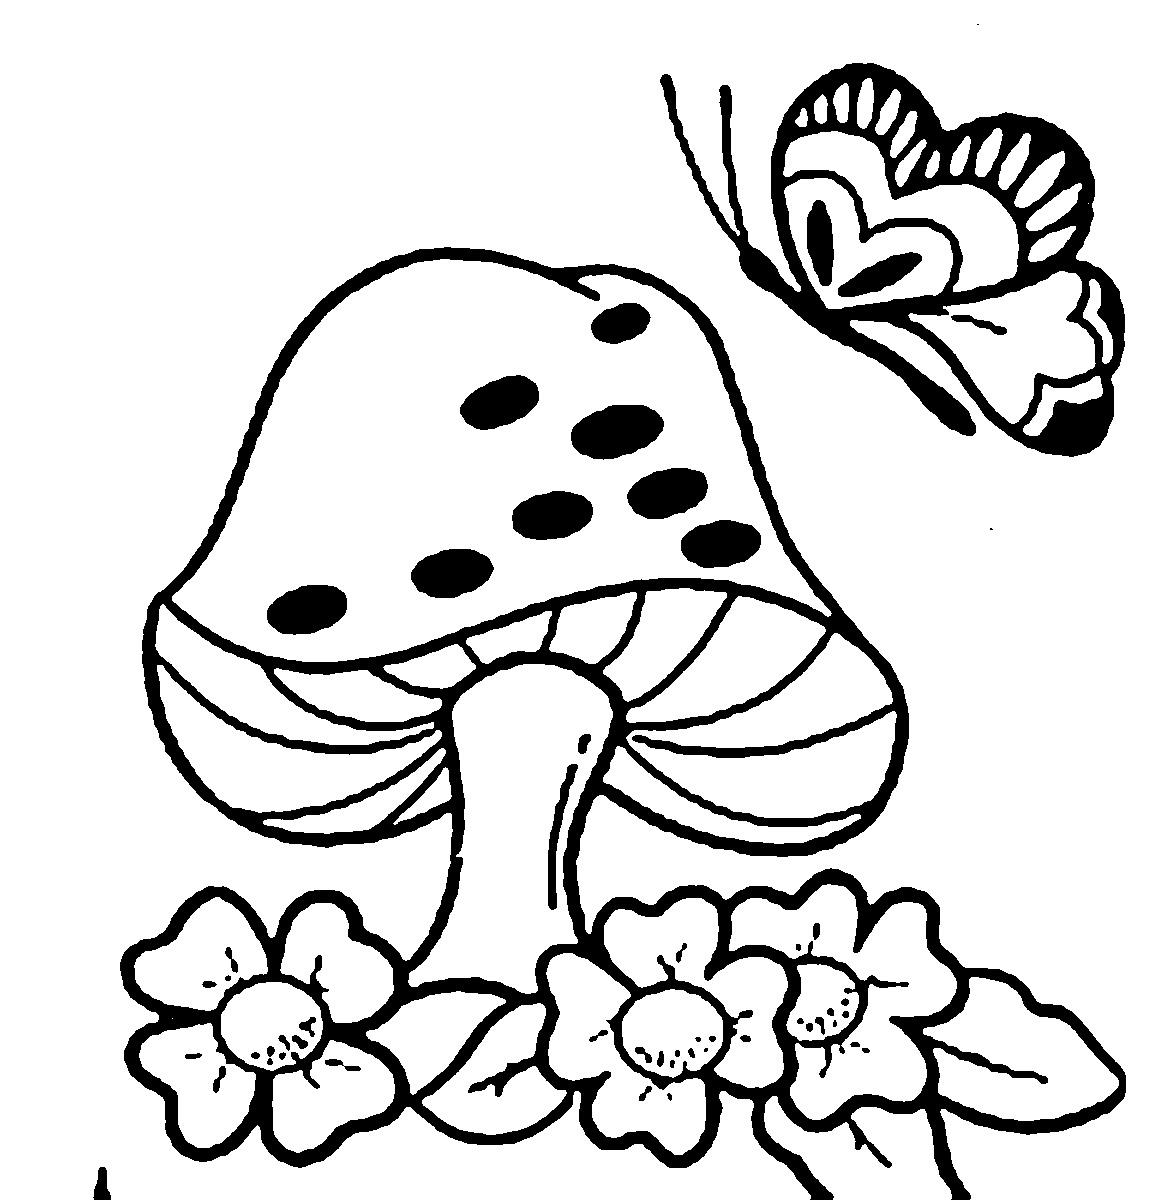 50 Desenhos Moldes E Riscos De Cogumelo Para Colorir